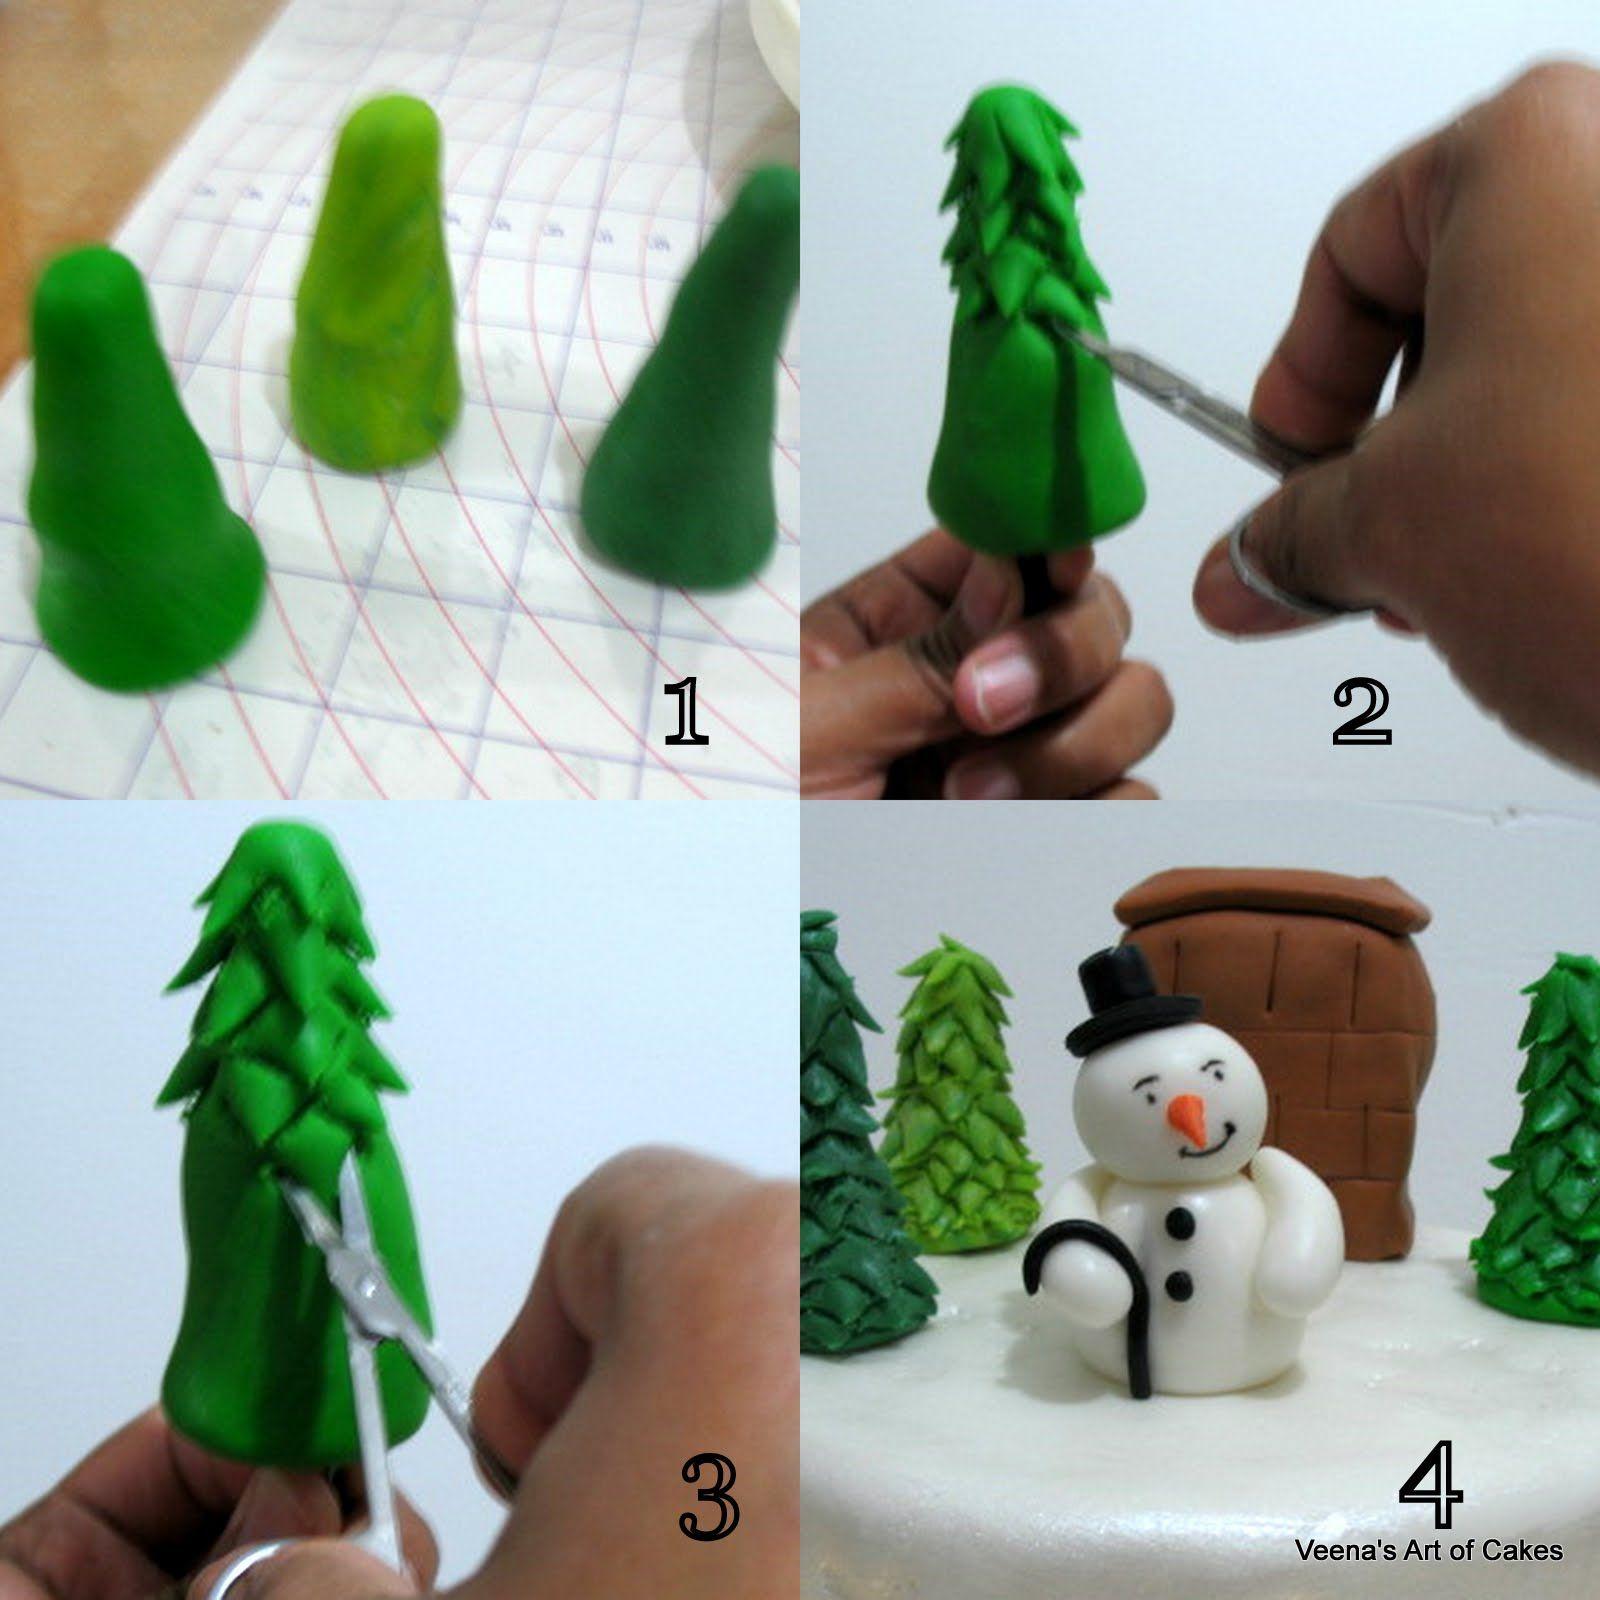 Veena Art Of Cake Fondant Recipe : Veena s Art of Cakes: My Christmas Cake with gumpaste ...